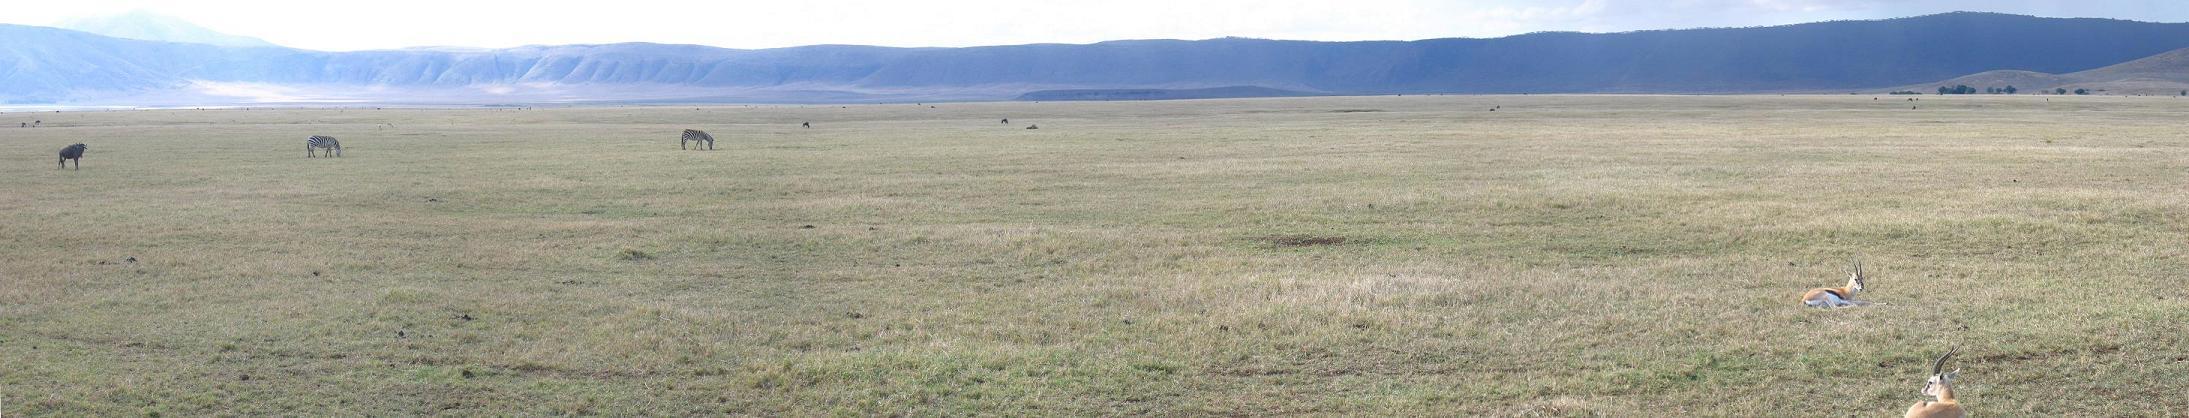 Tanzania_ngorongorofloor